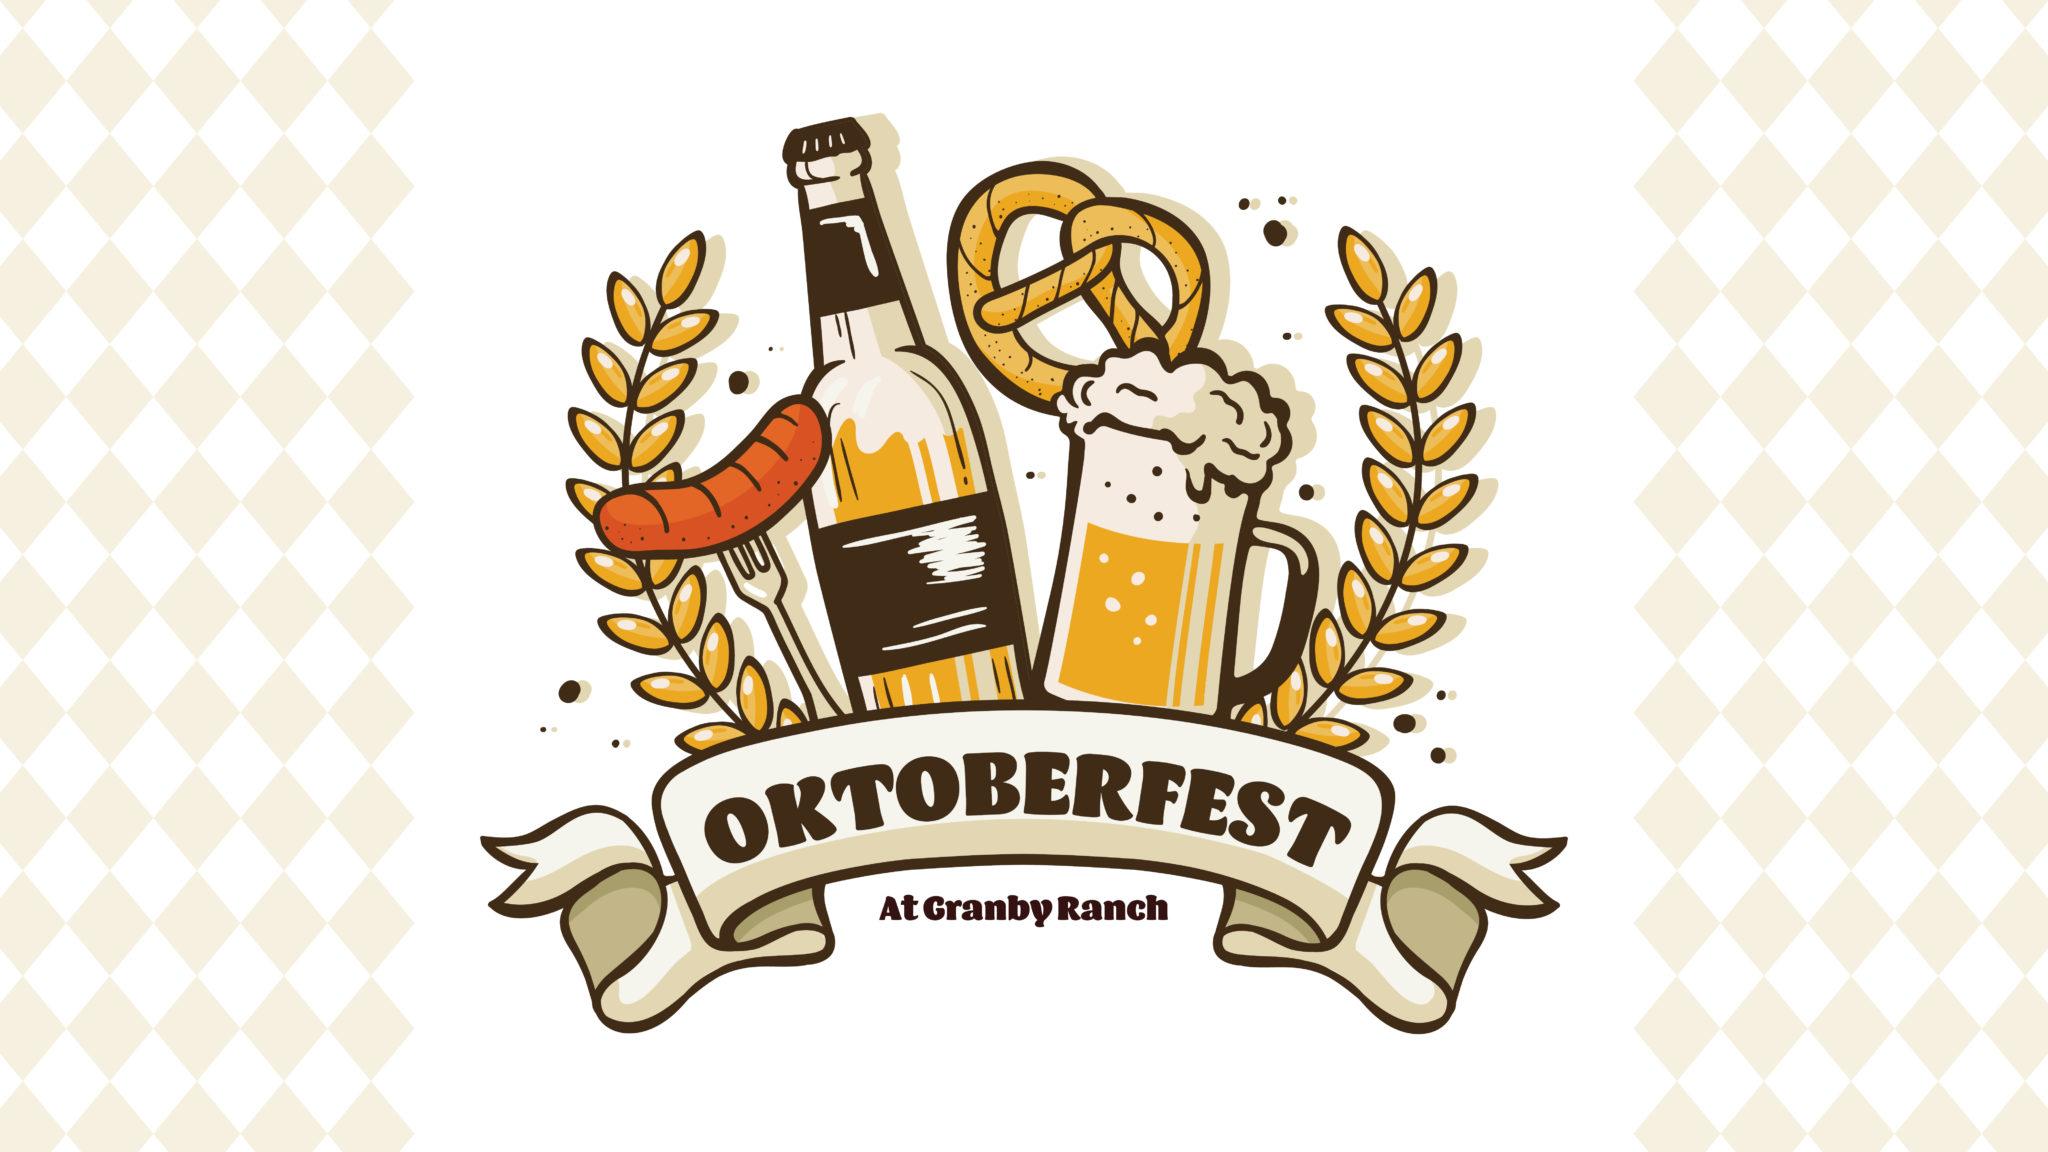 oktoberfest bilder 3 - Oktoberfest bilder